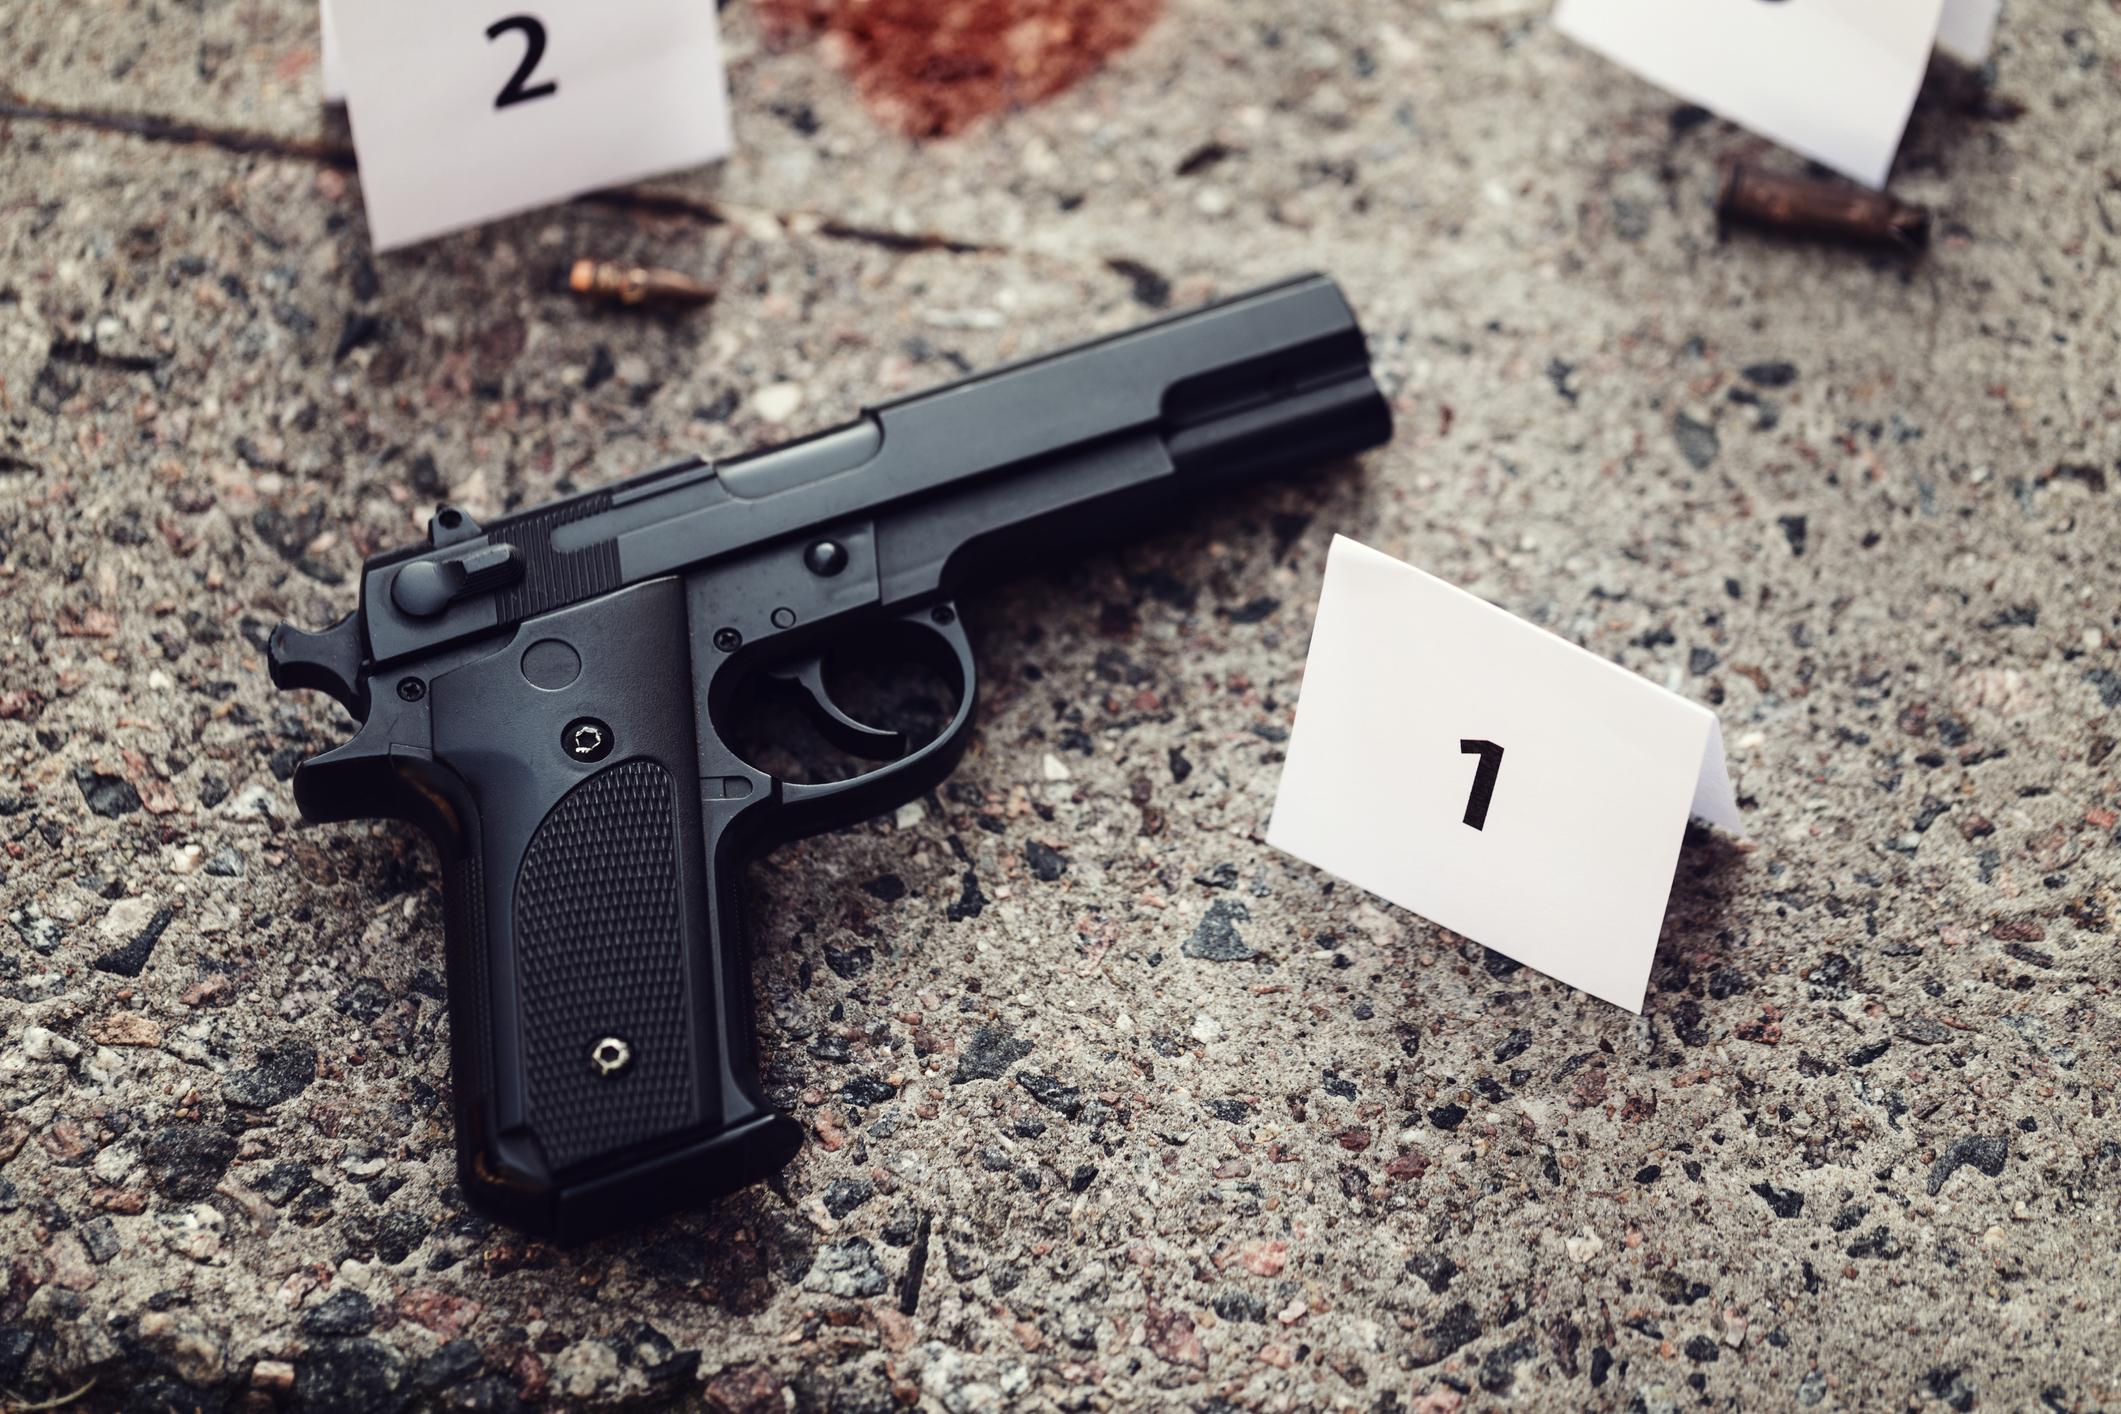 Pistola en un piso manchado de sangre junto a marcadores de evidencia.